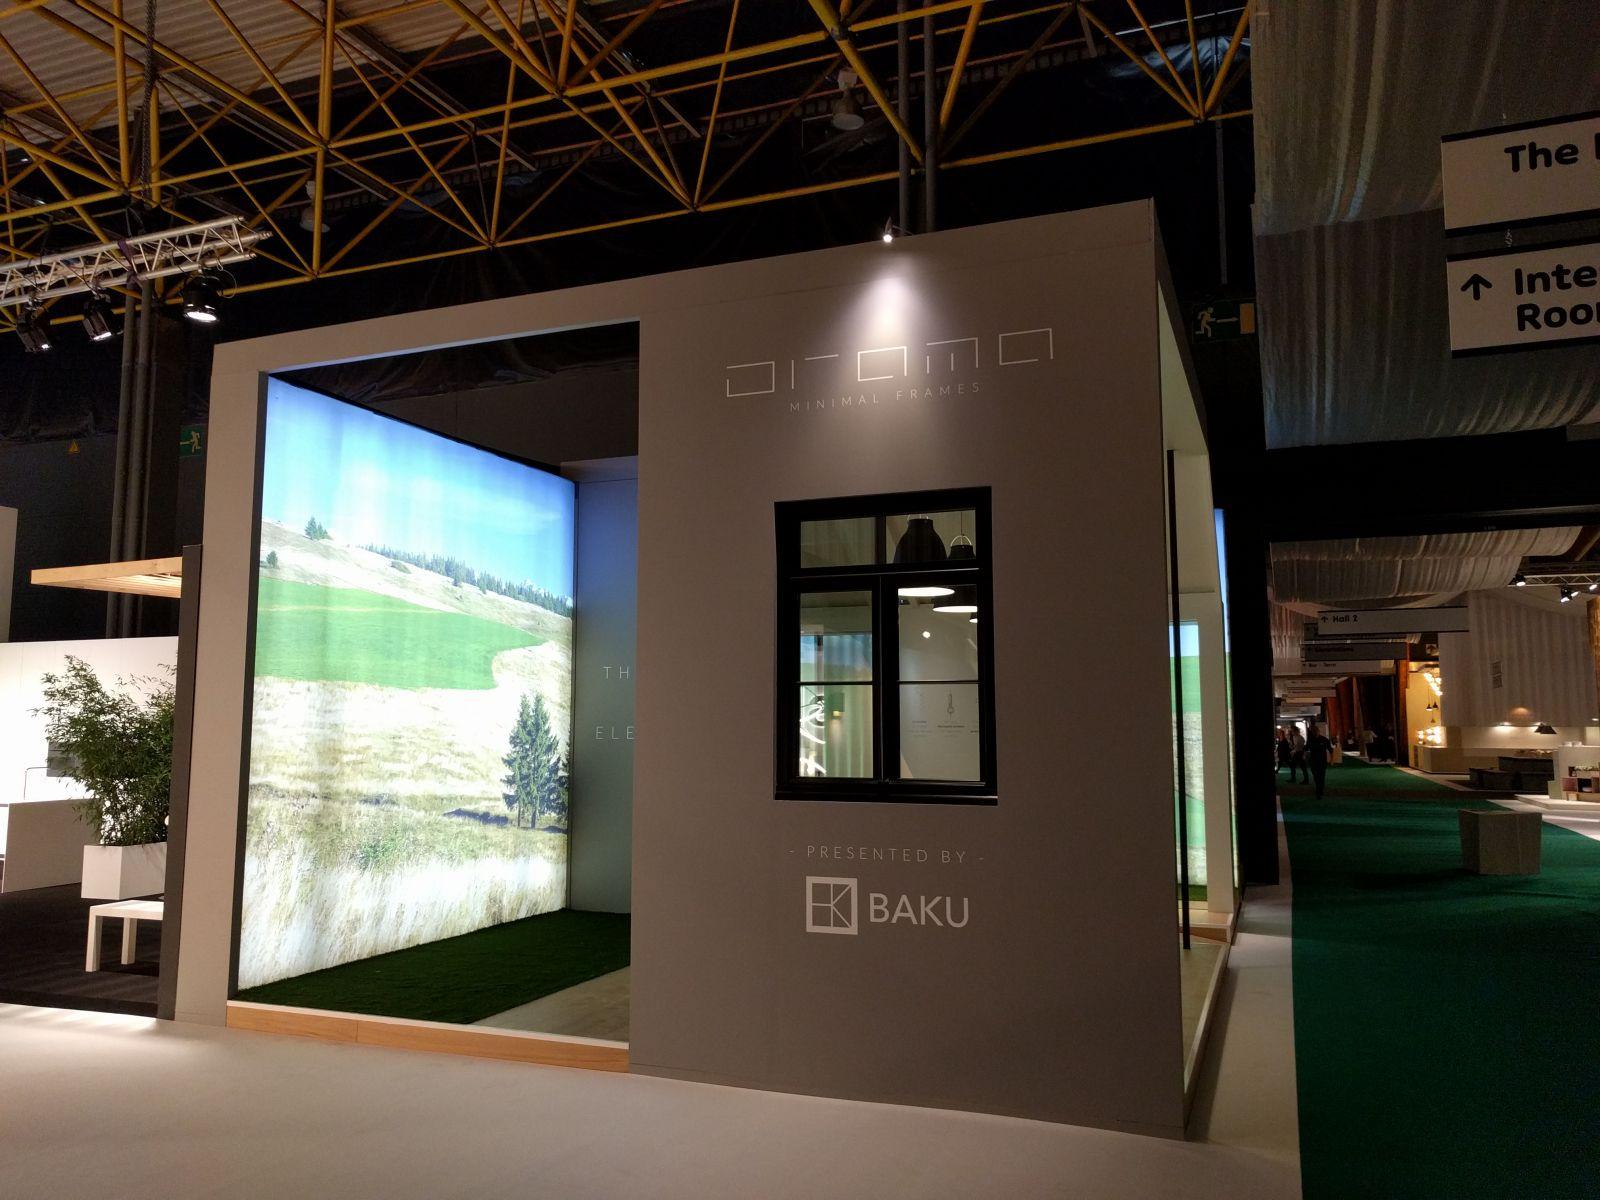 Baku ng op interieur kortrijk 2016 inspiratie baku for Interieur kortrijk